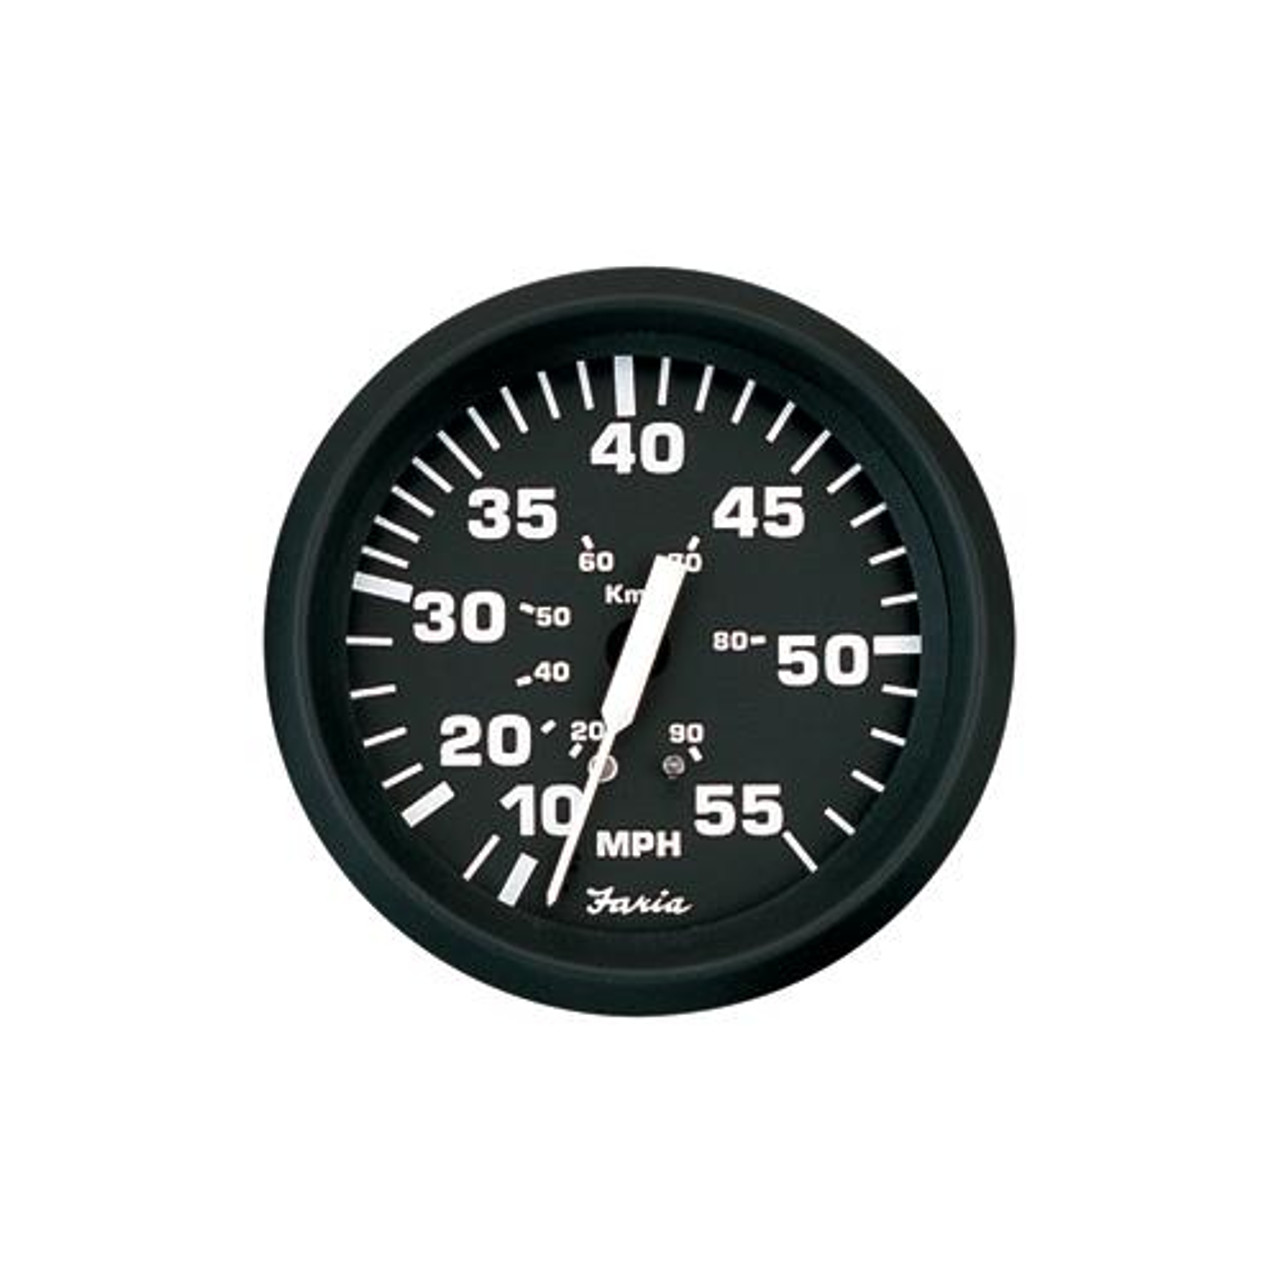 Mechanical Faria 4 Speedometer - Euro White 80MPH